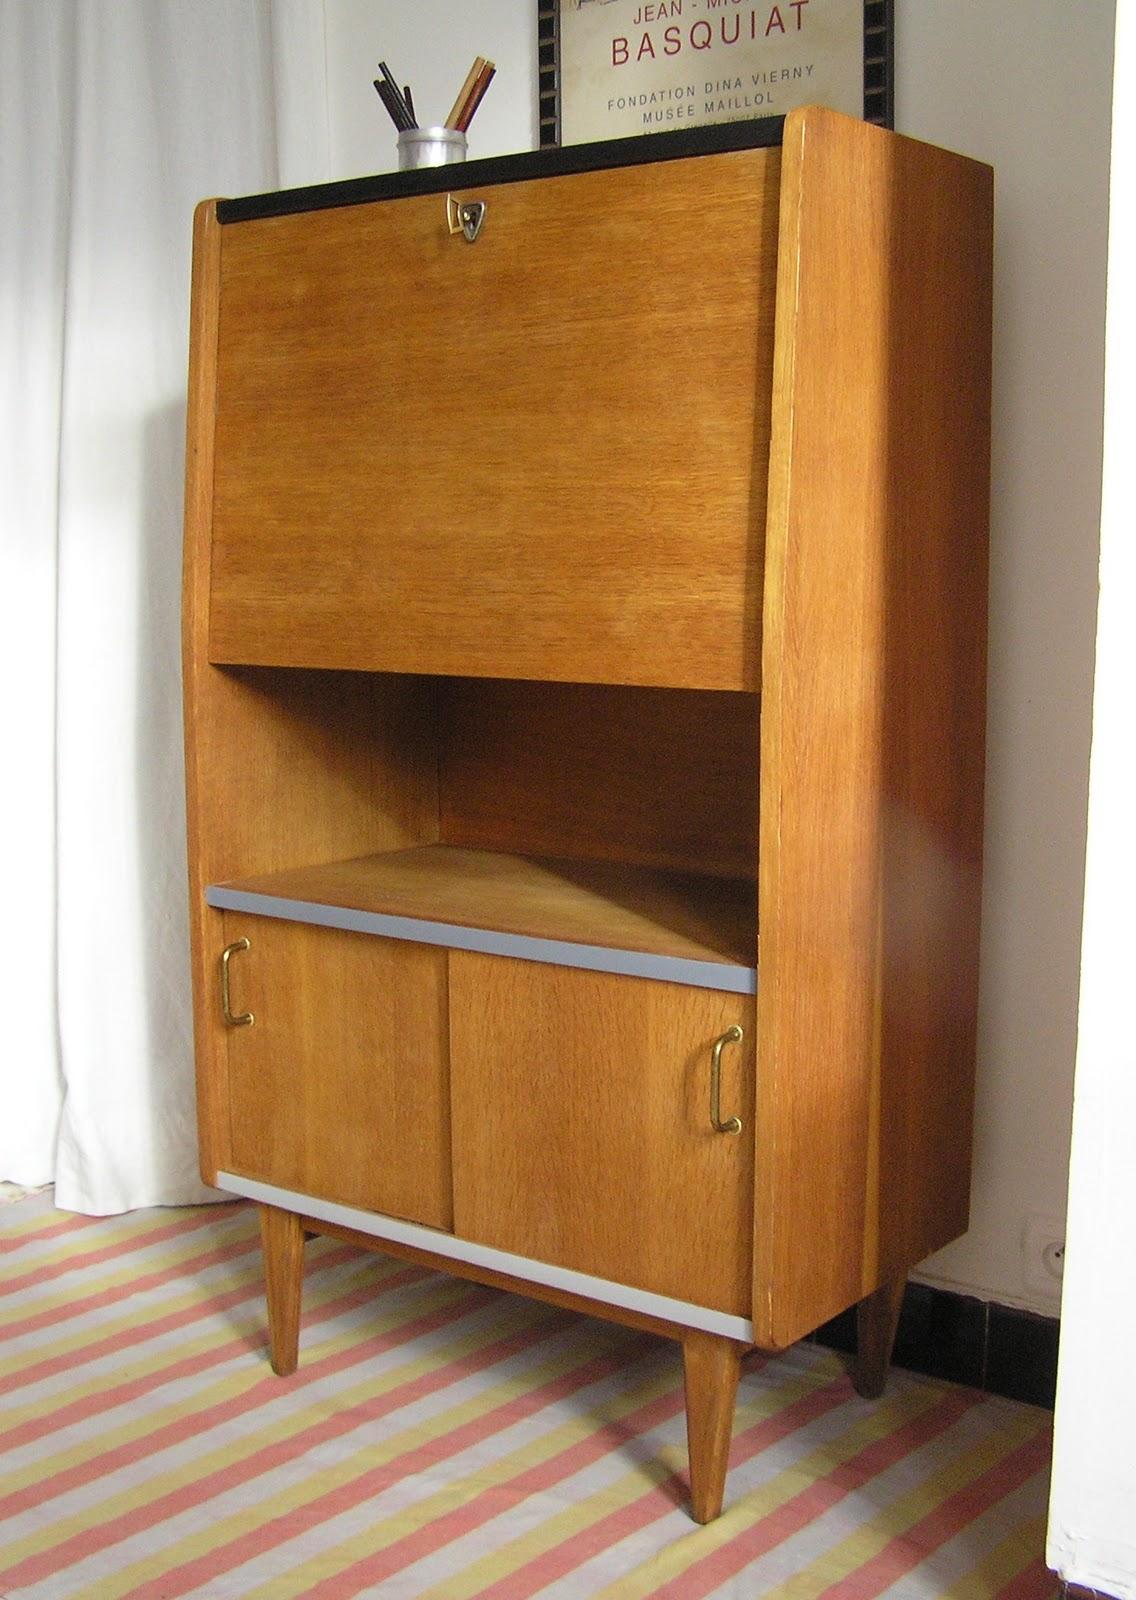 jaune moutarde secr taire ann es 50. Black Bedroom Furniture Sets. Home Design Ideas